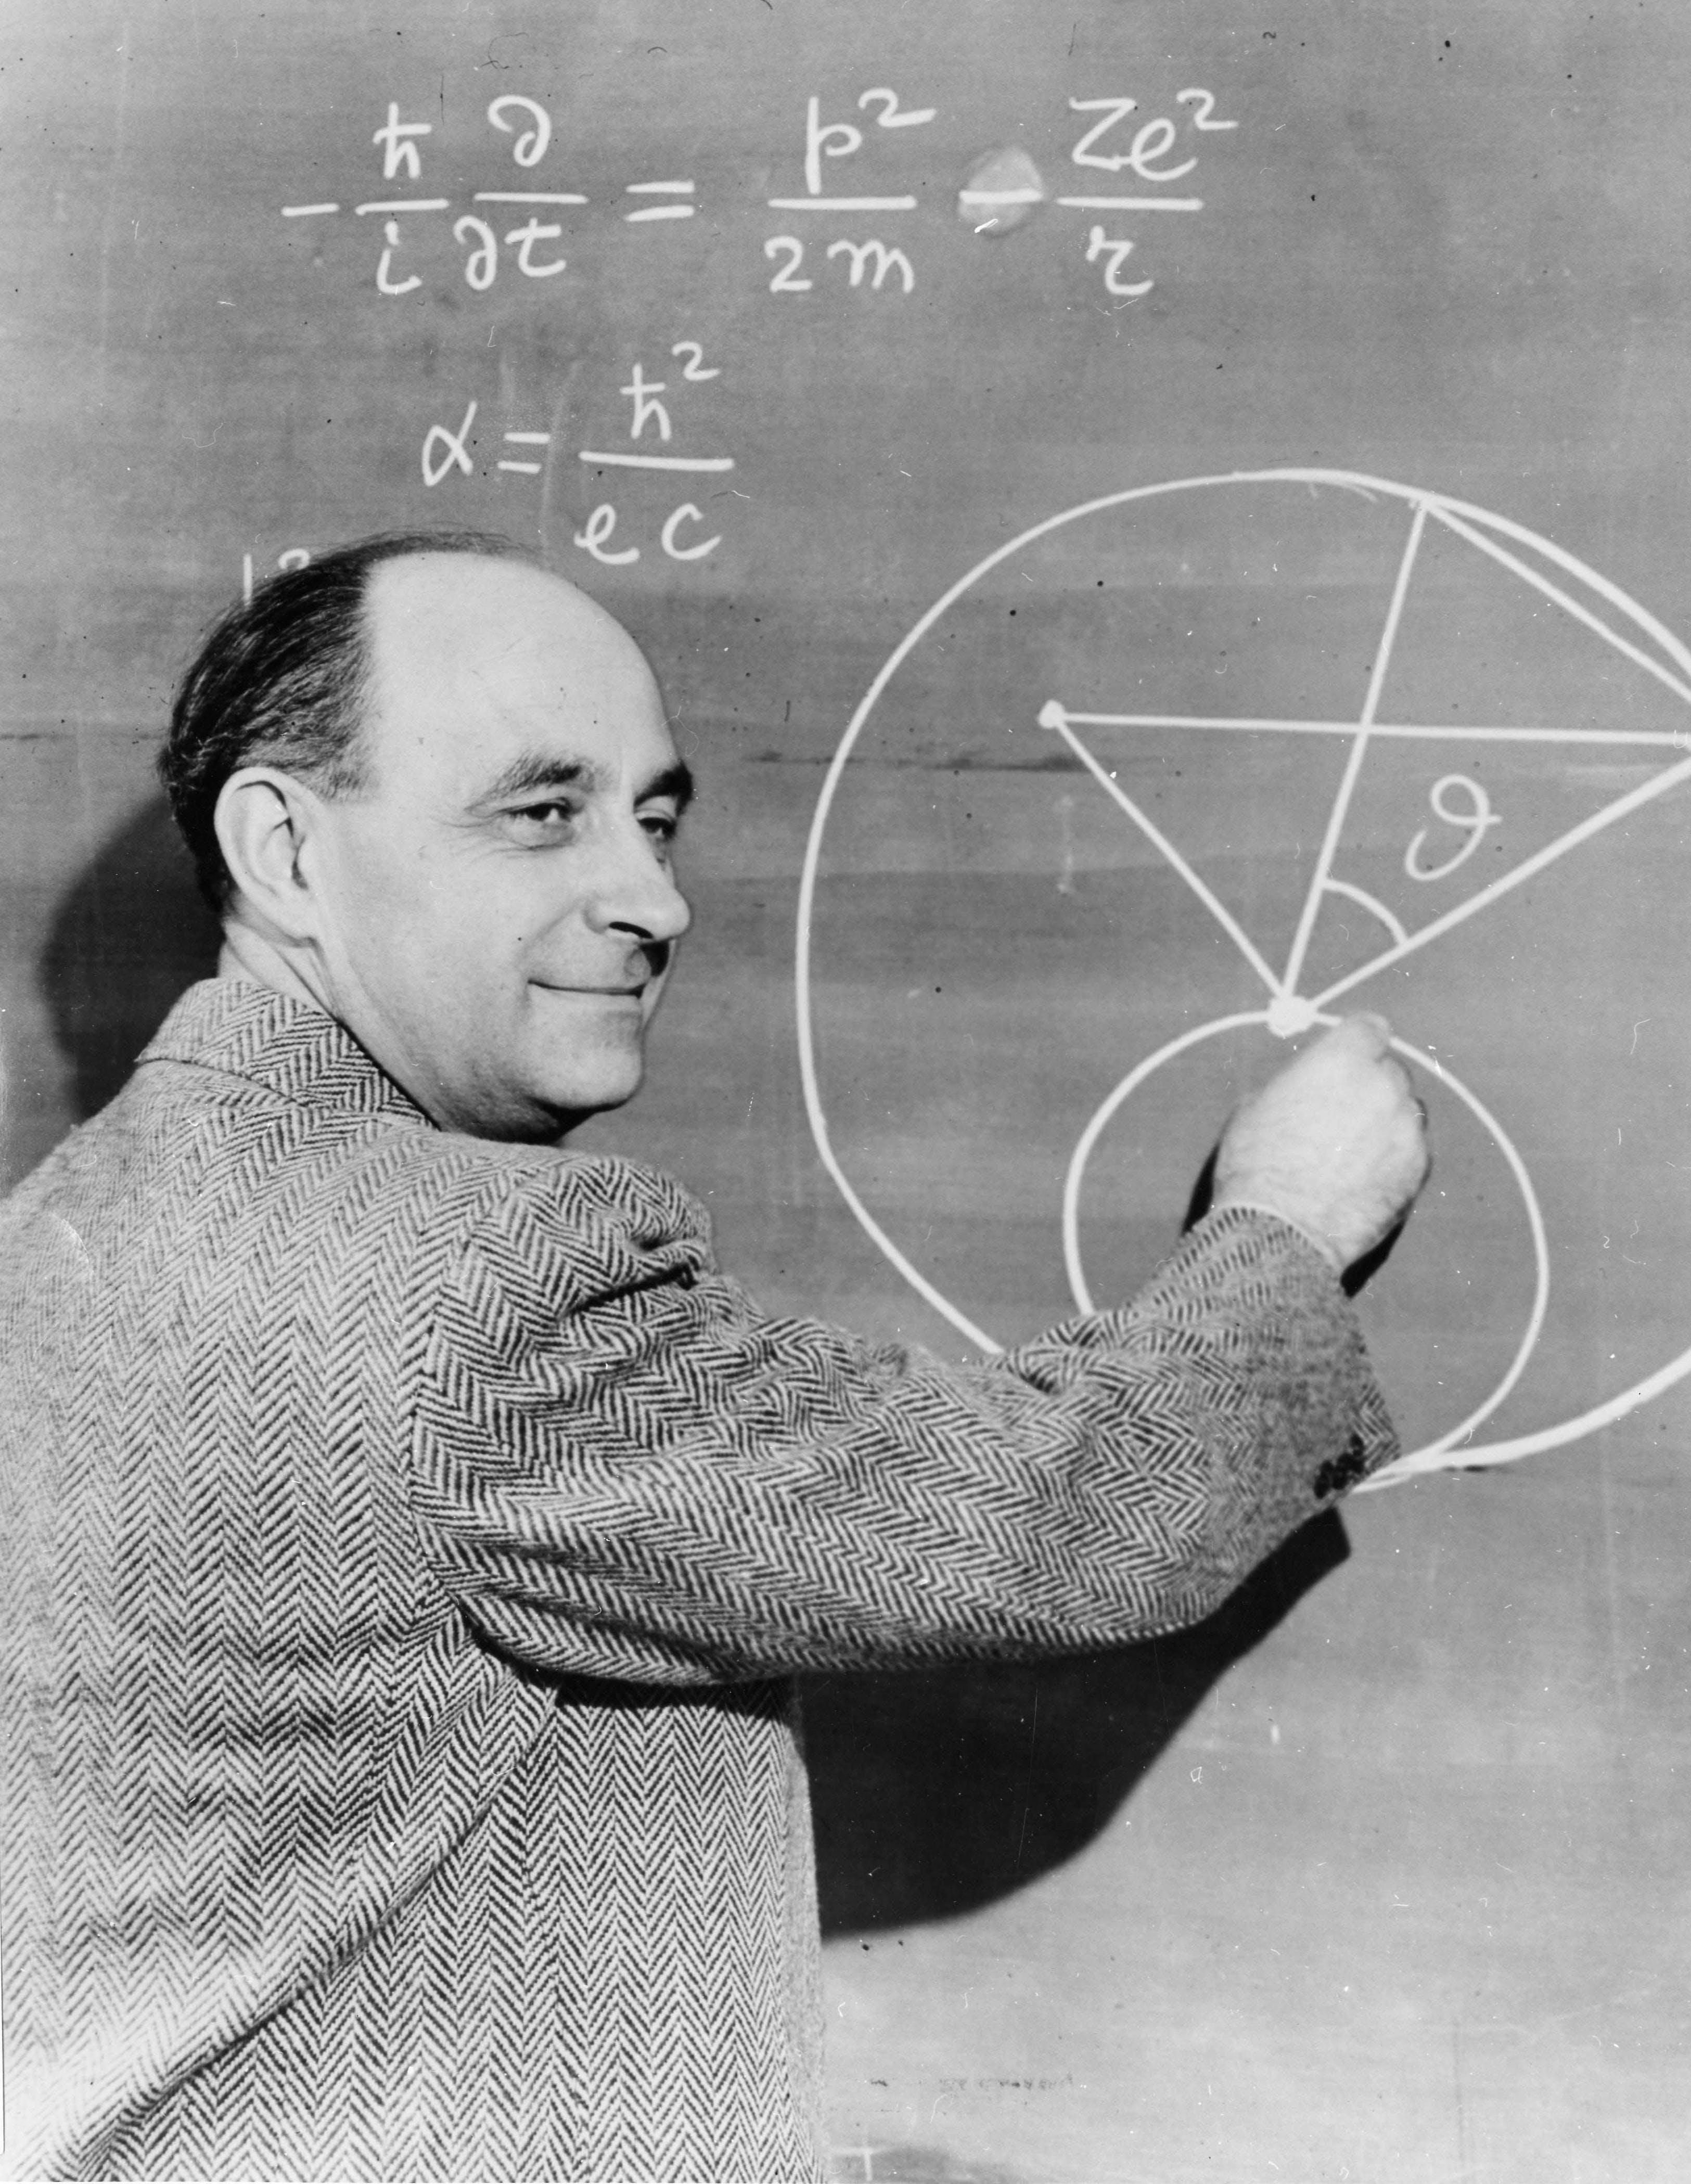 I mille nomi di Fermi: L'eredità di Enrico Fe